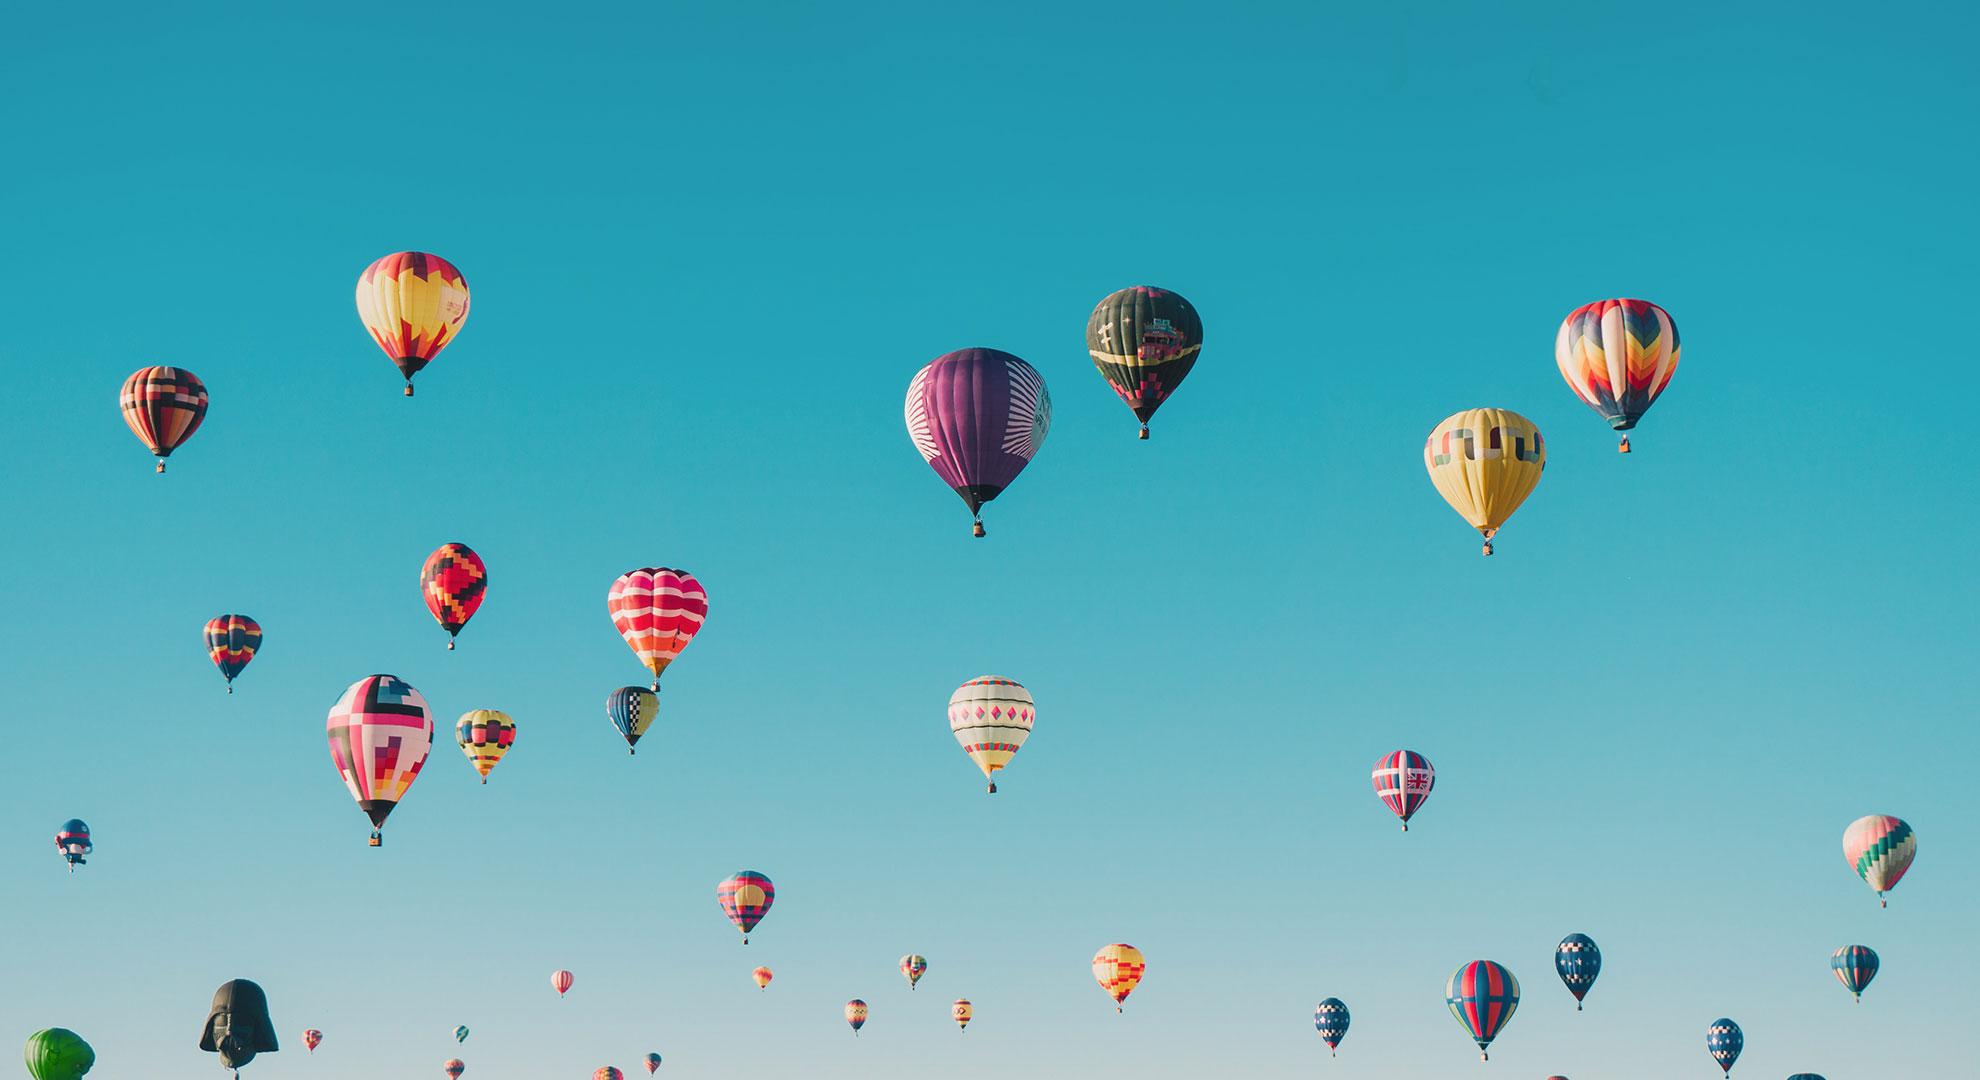 envolée de montgolfières sur fond de ciel bleu flamboyant - header formation intra entreprises kodama